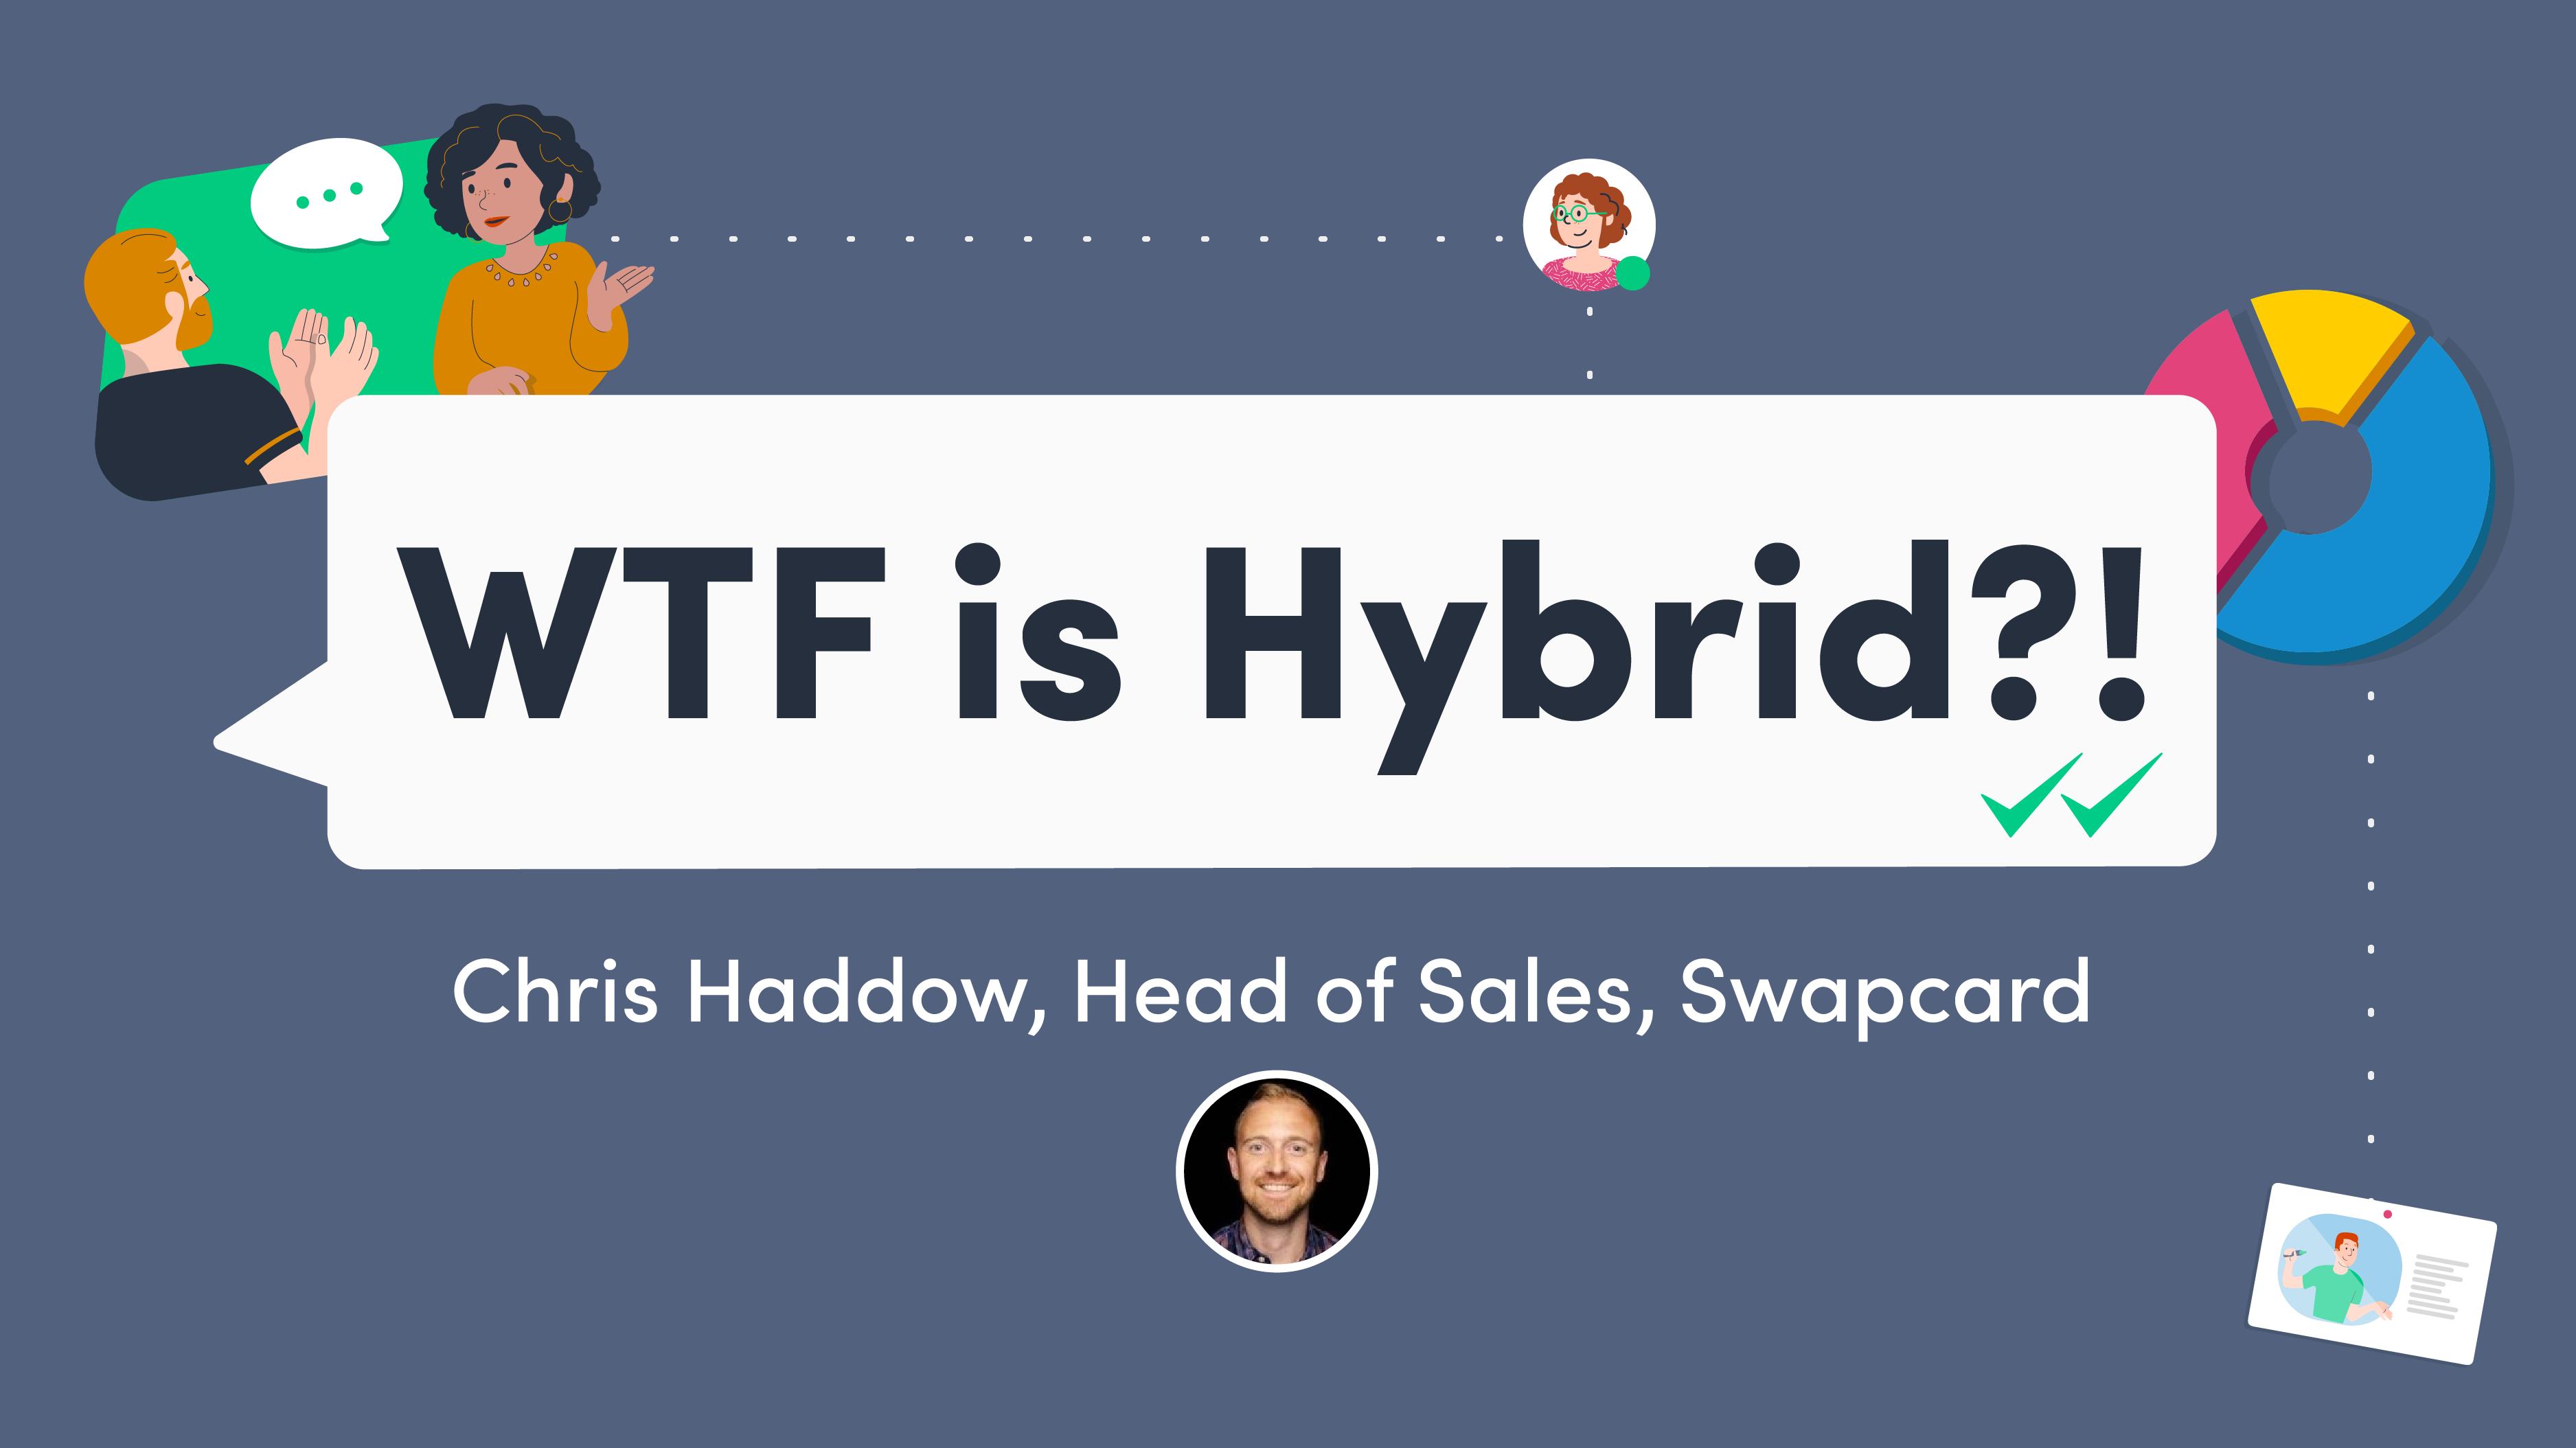 WTF is Hybrid